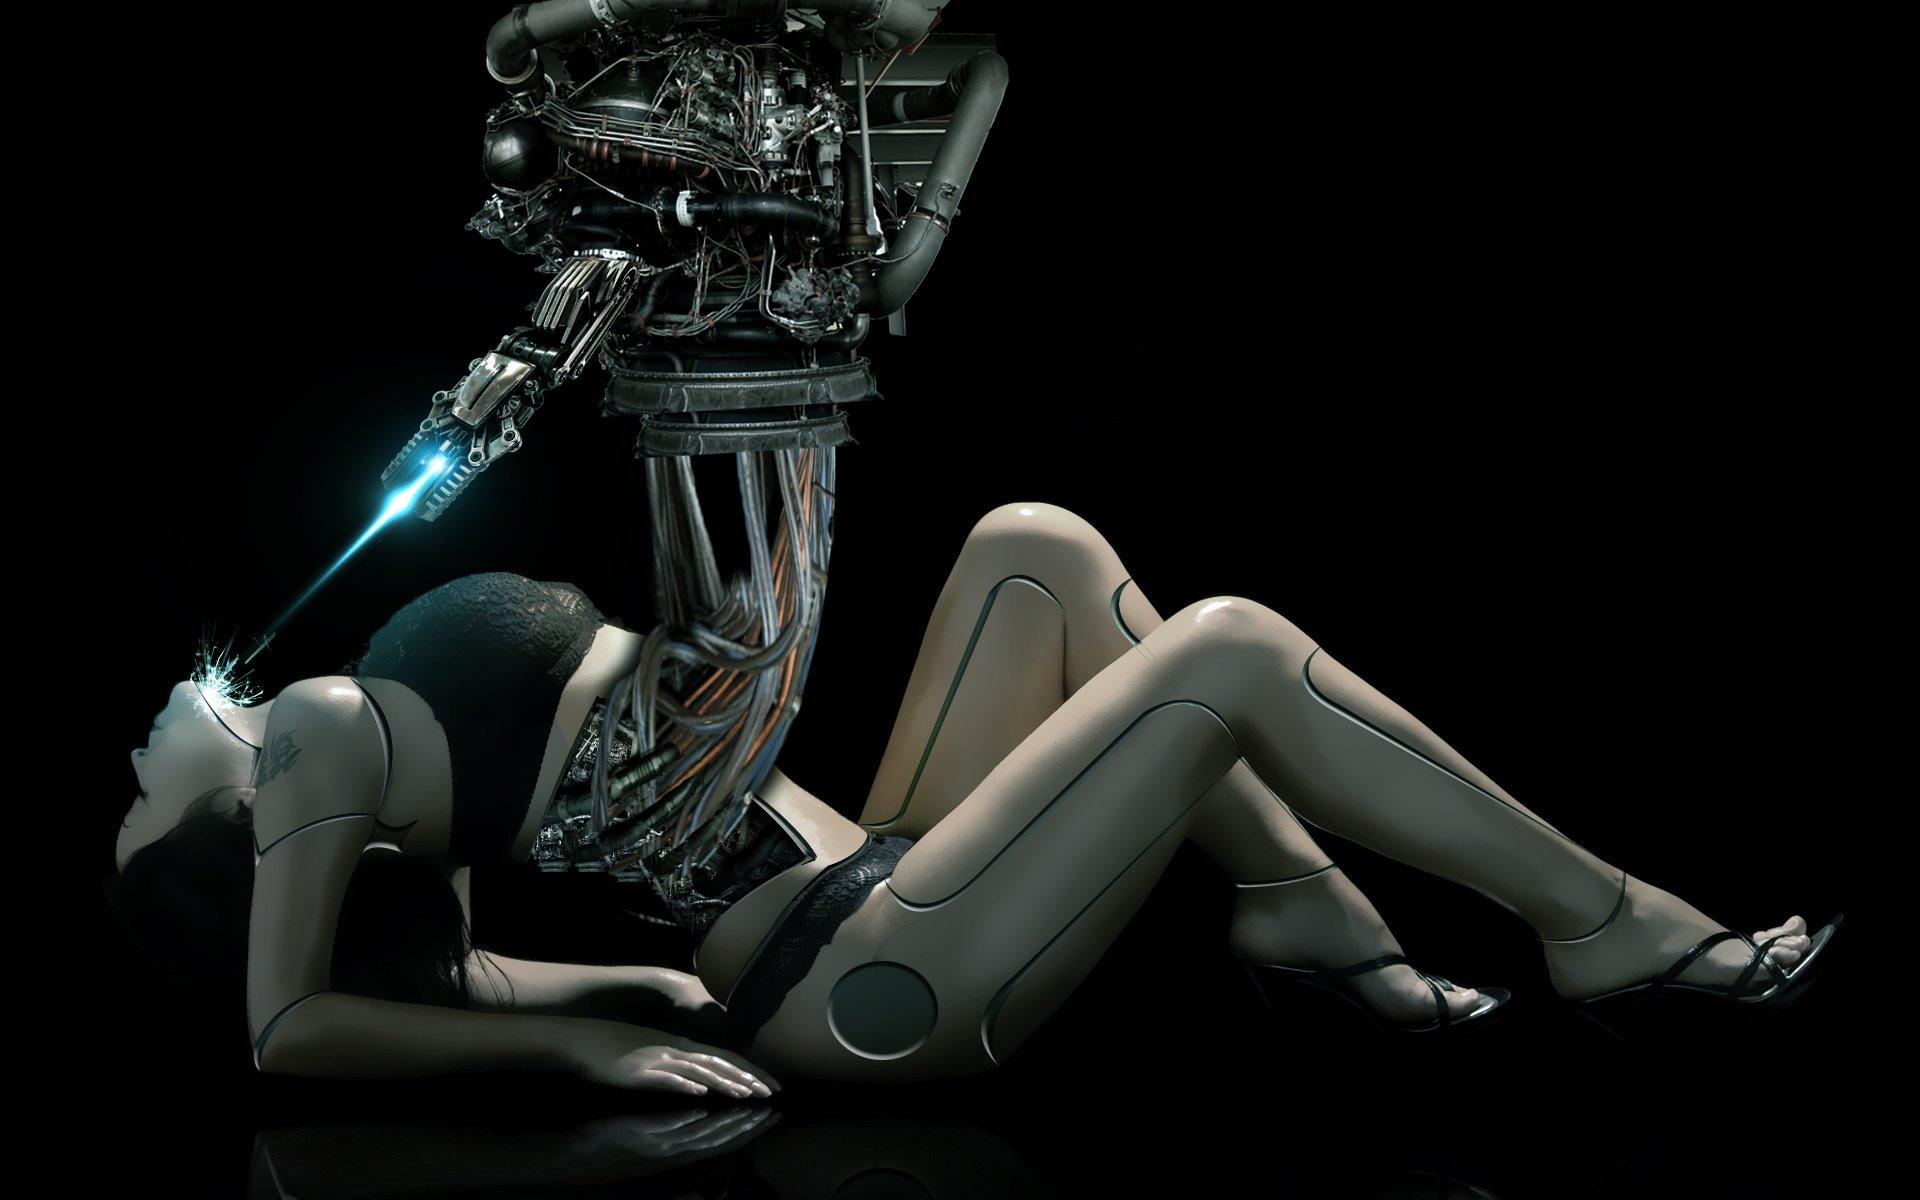 Cyborg robot sci-fi futuristic technics wallpaper ...